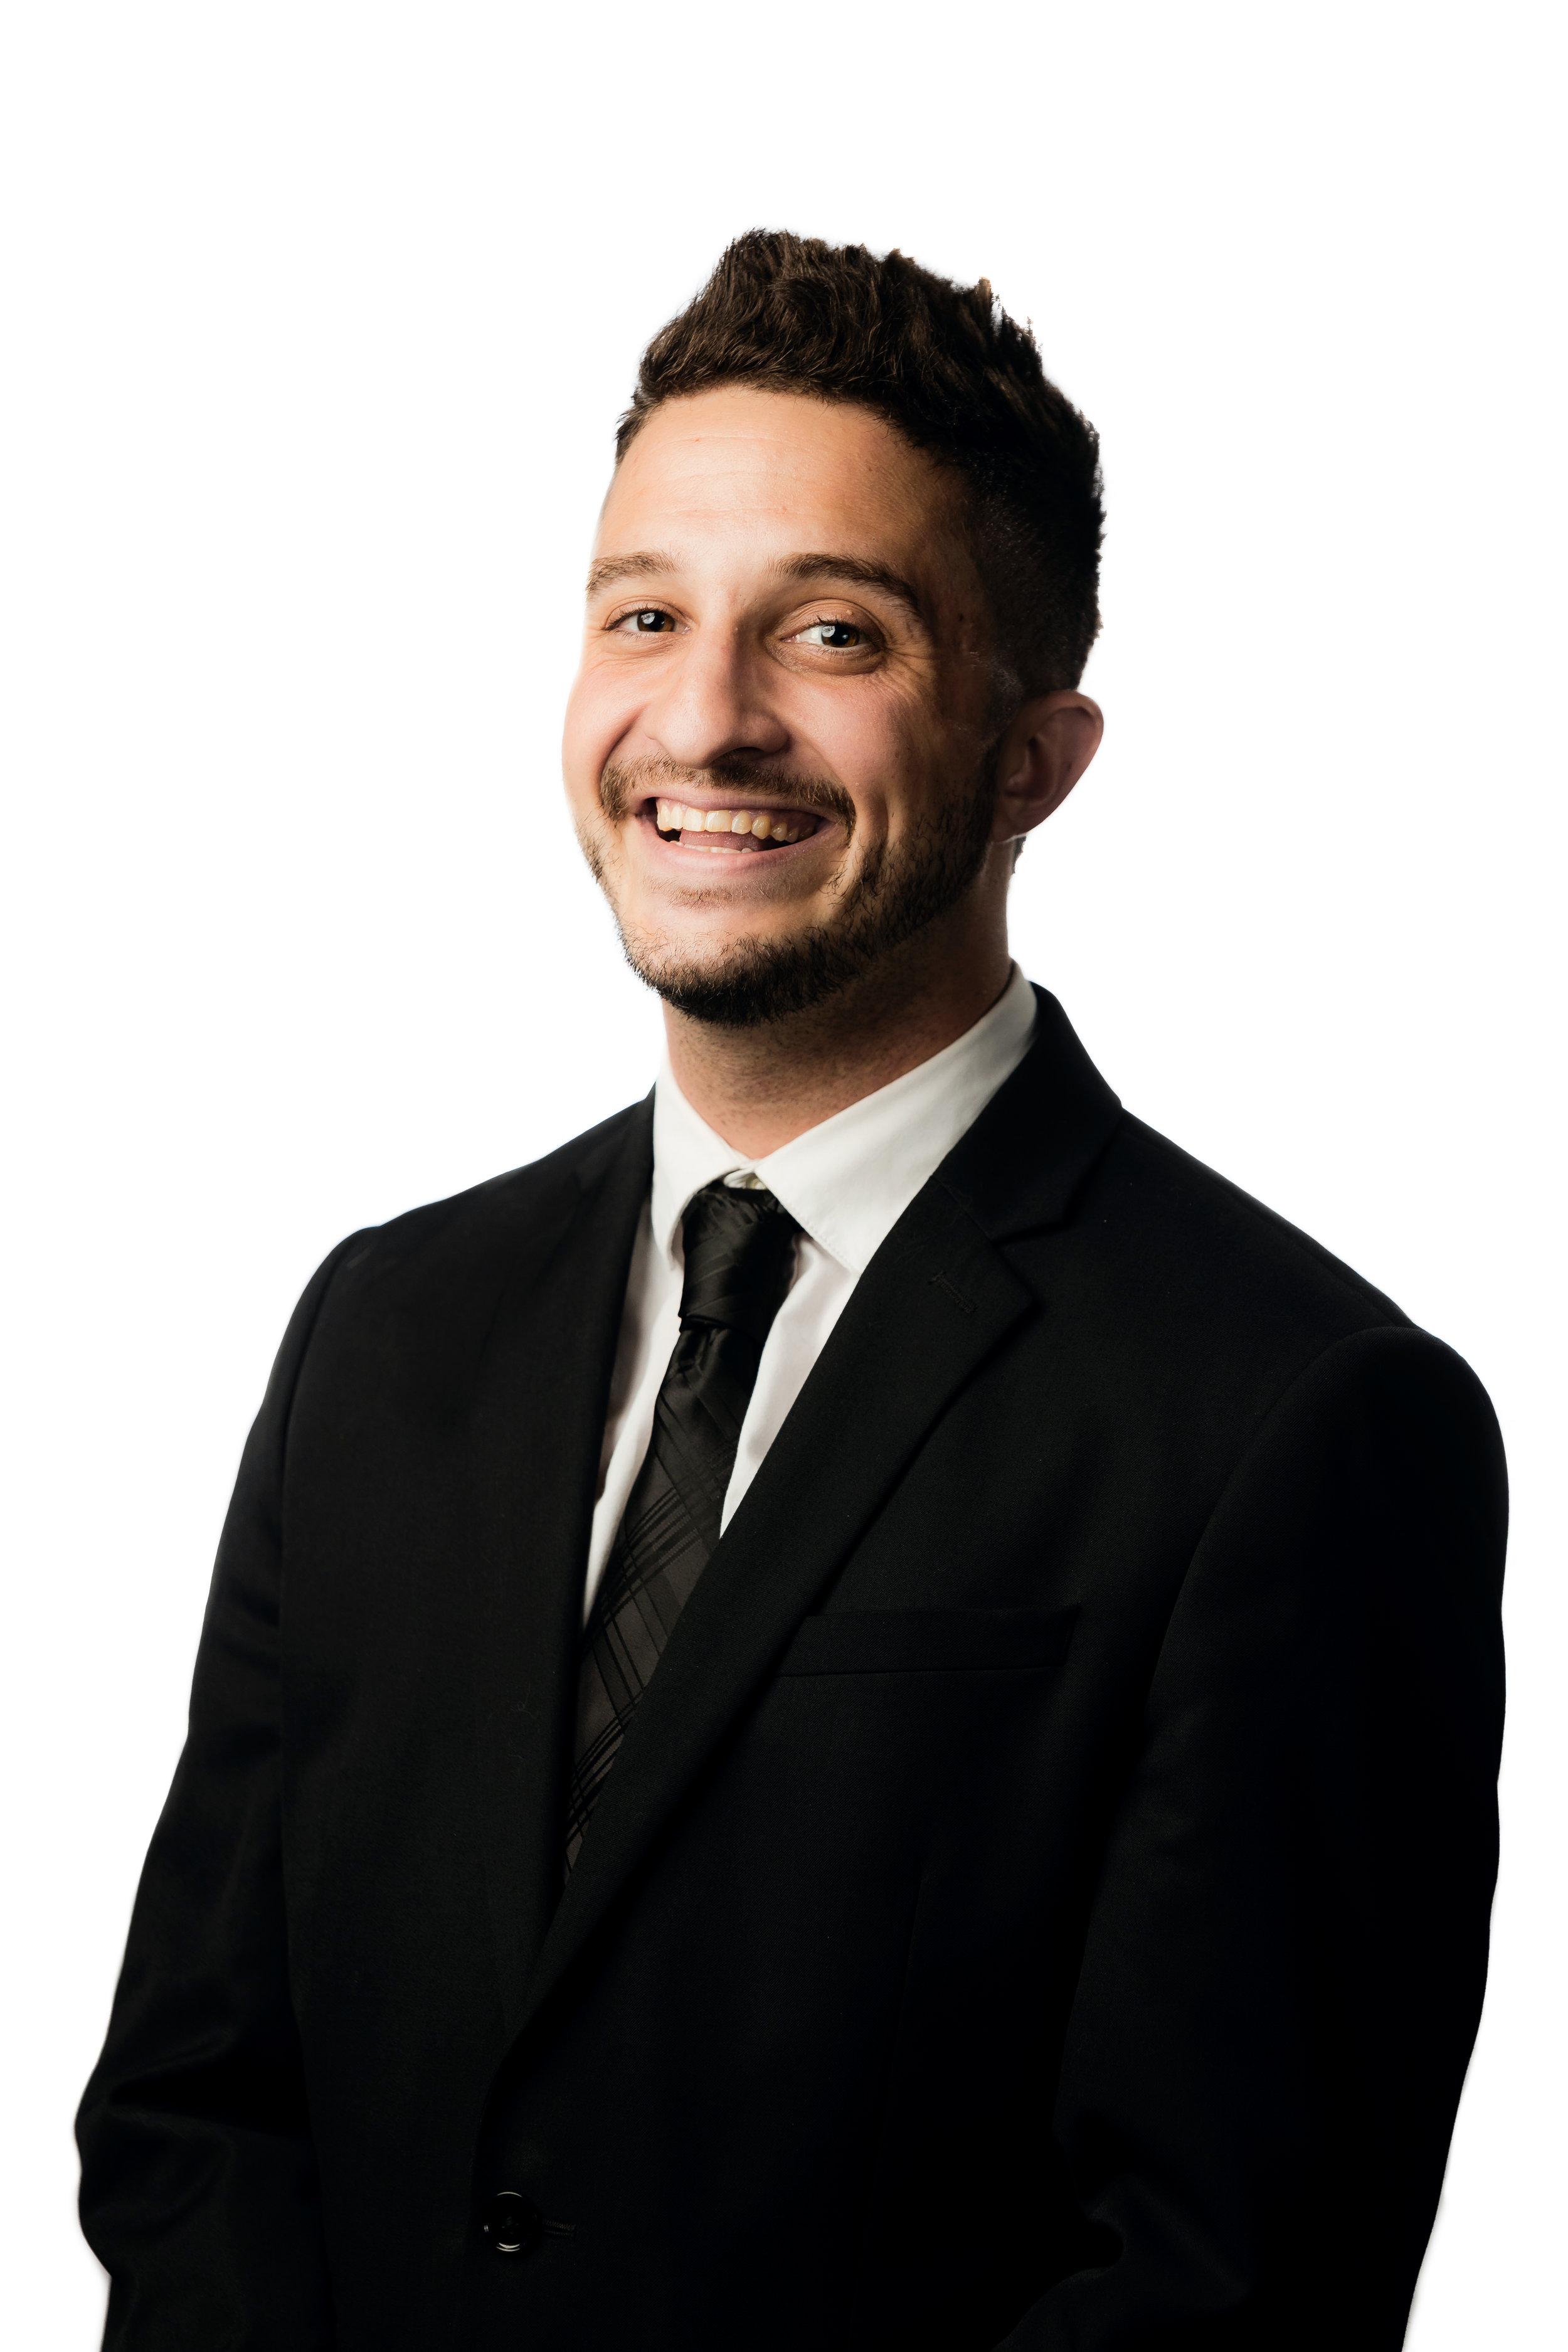 Kevin Garrity, Host